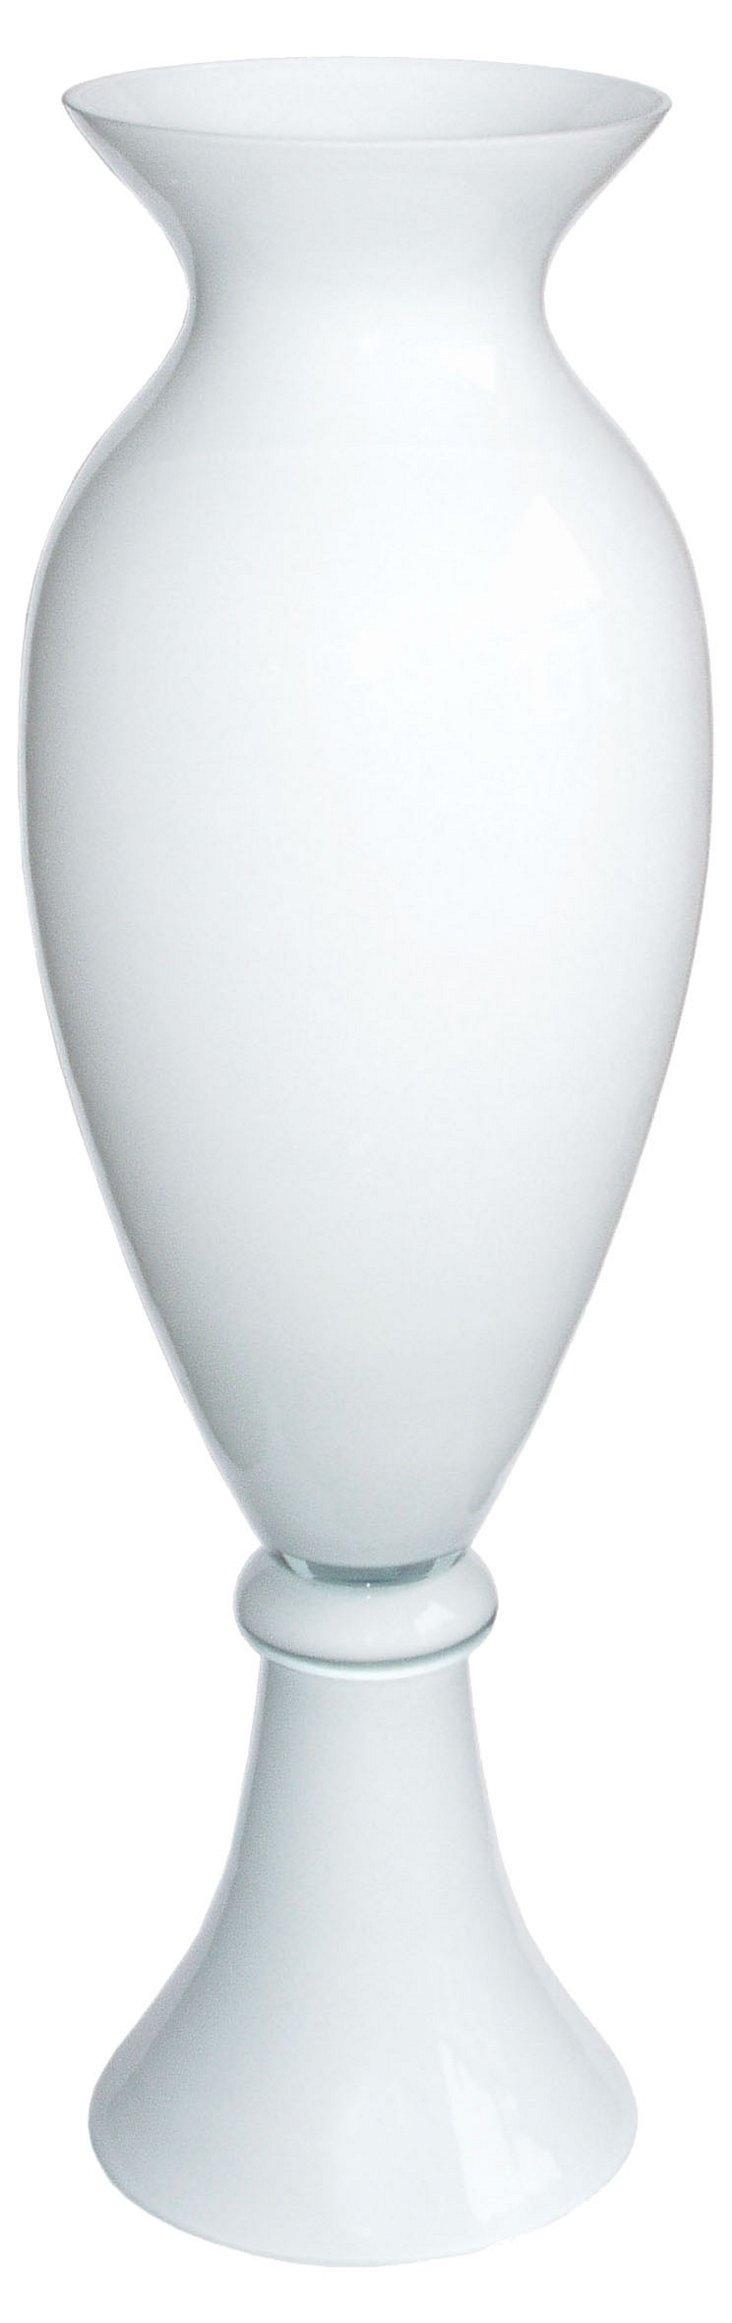 Atlantic Glass Vase, White